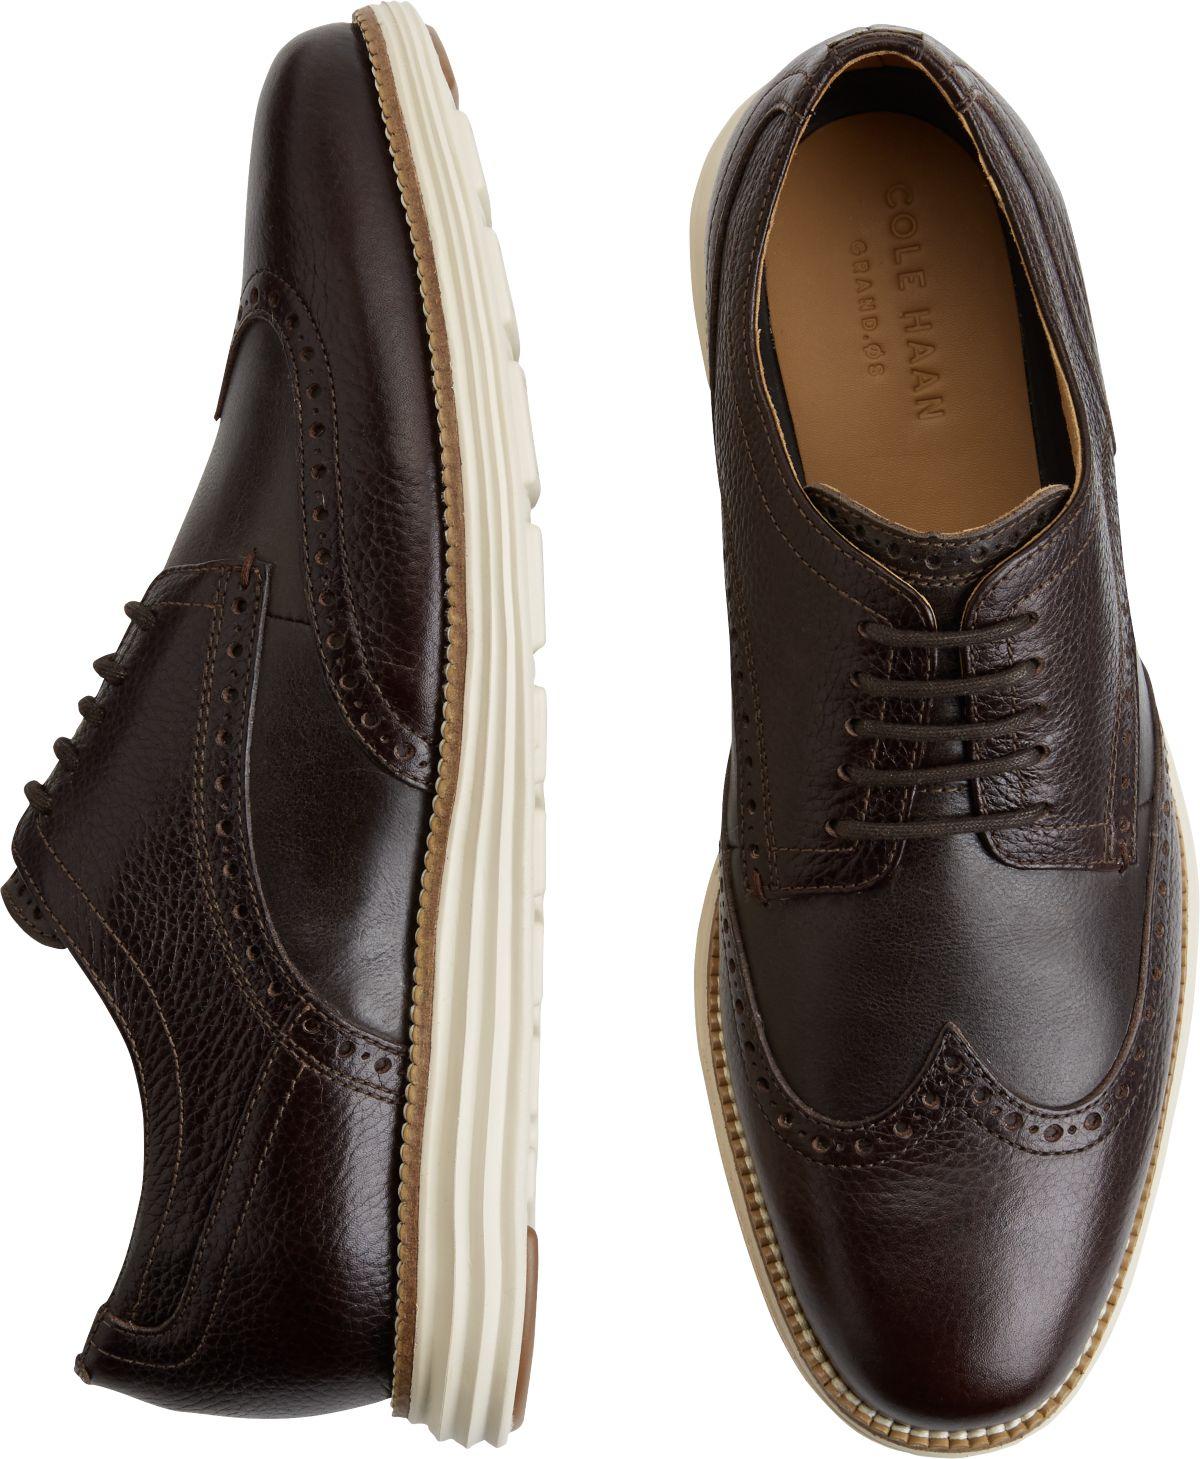 s shoes dress shoes boots s wearhouse